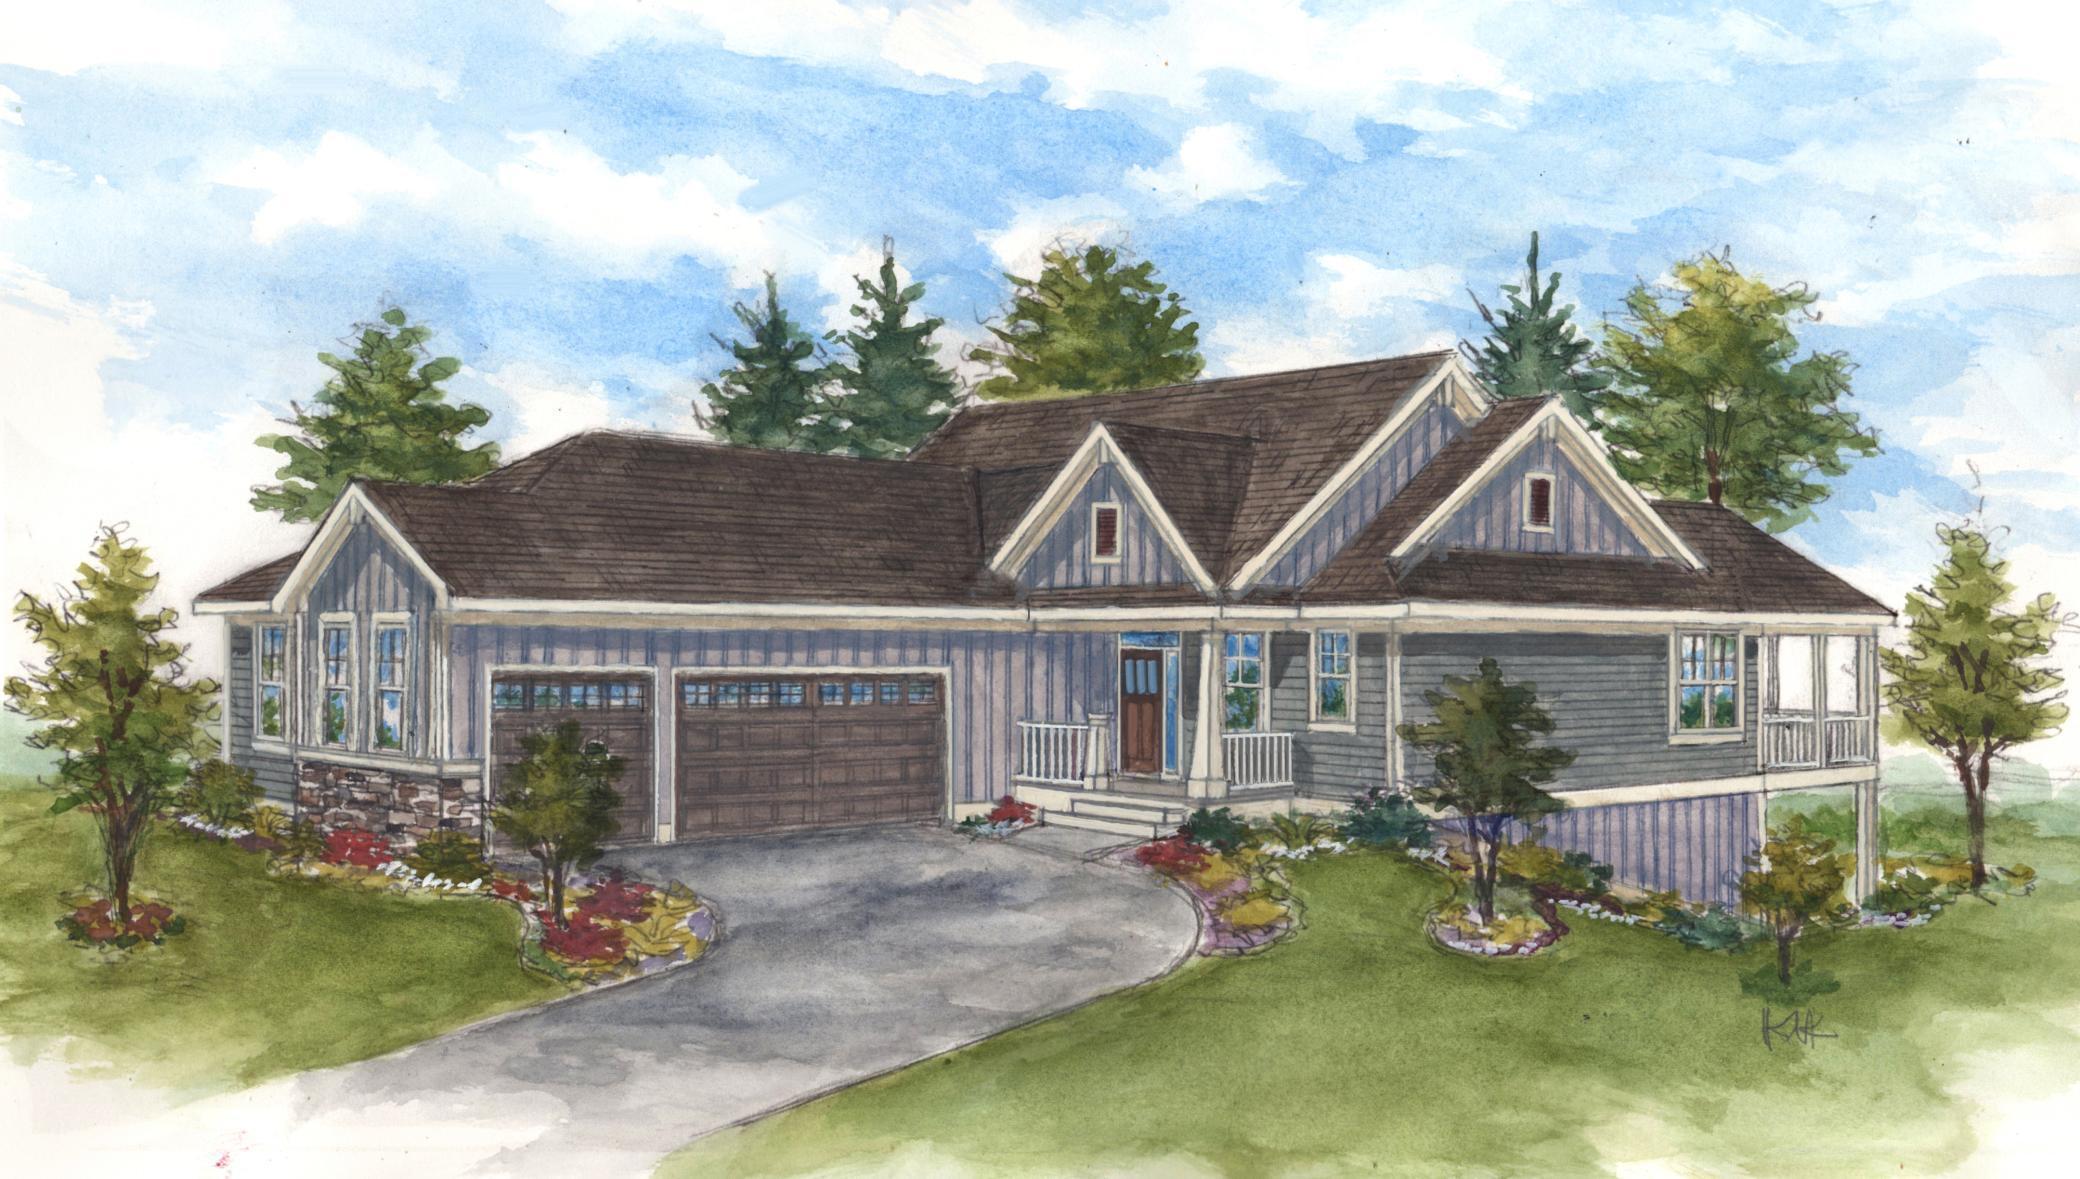 11527 Arnie Way N Property Photo - Lake Elmo, MN real estate listing